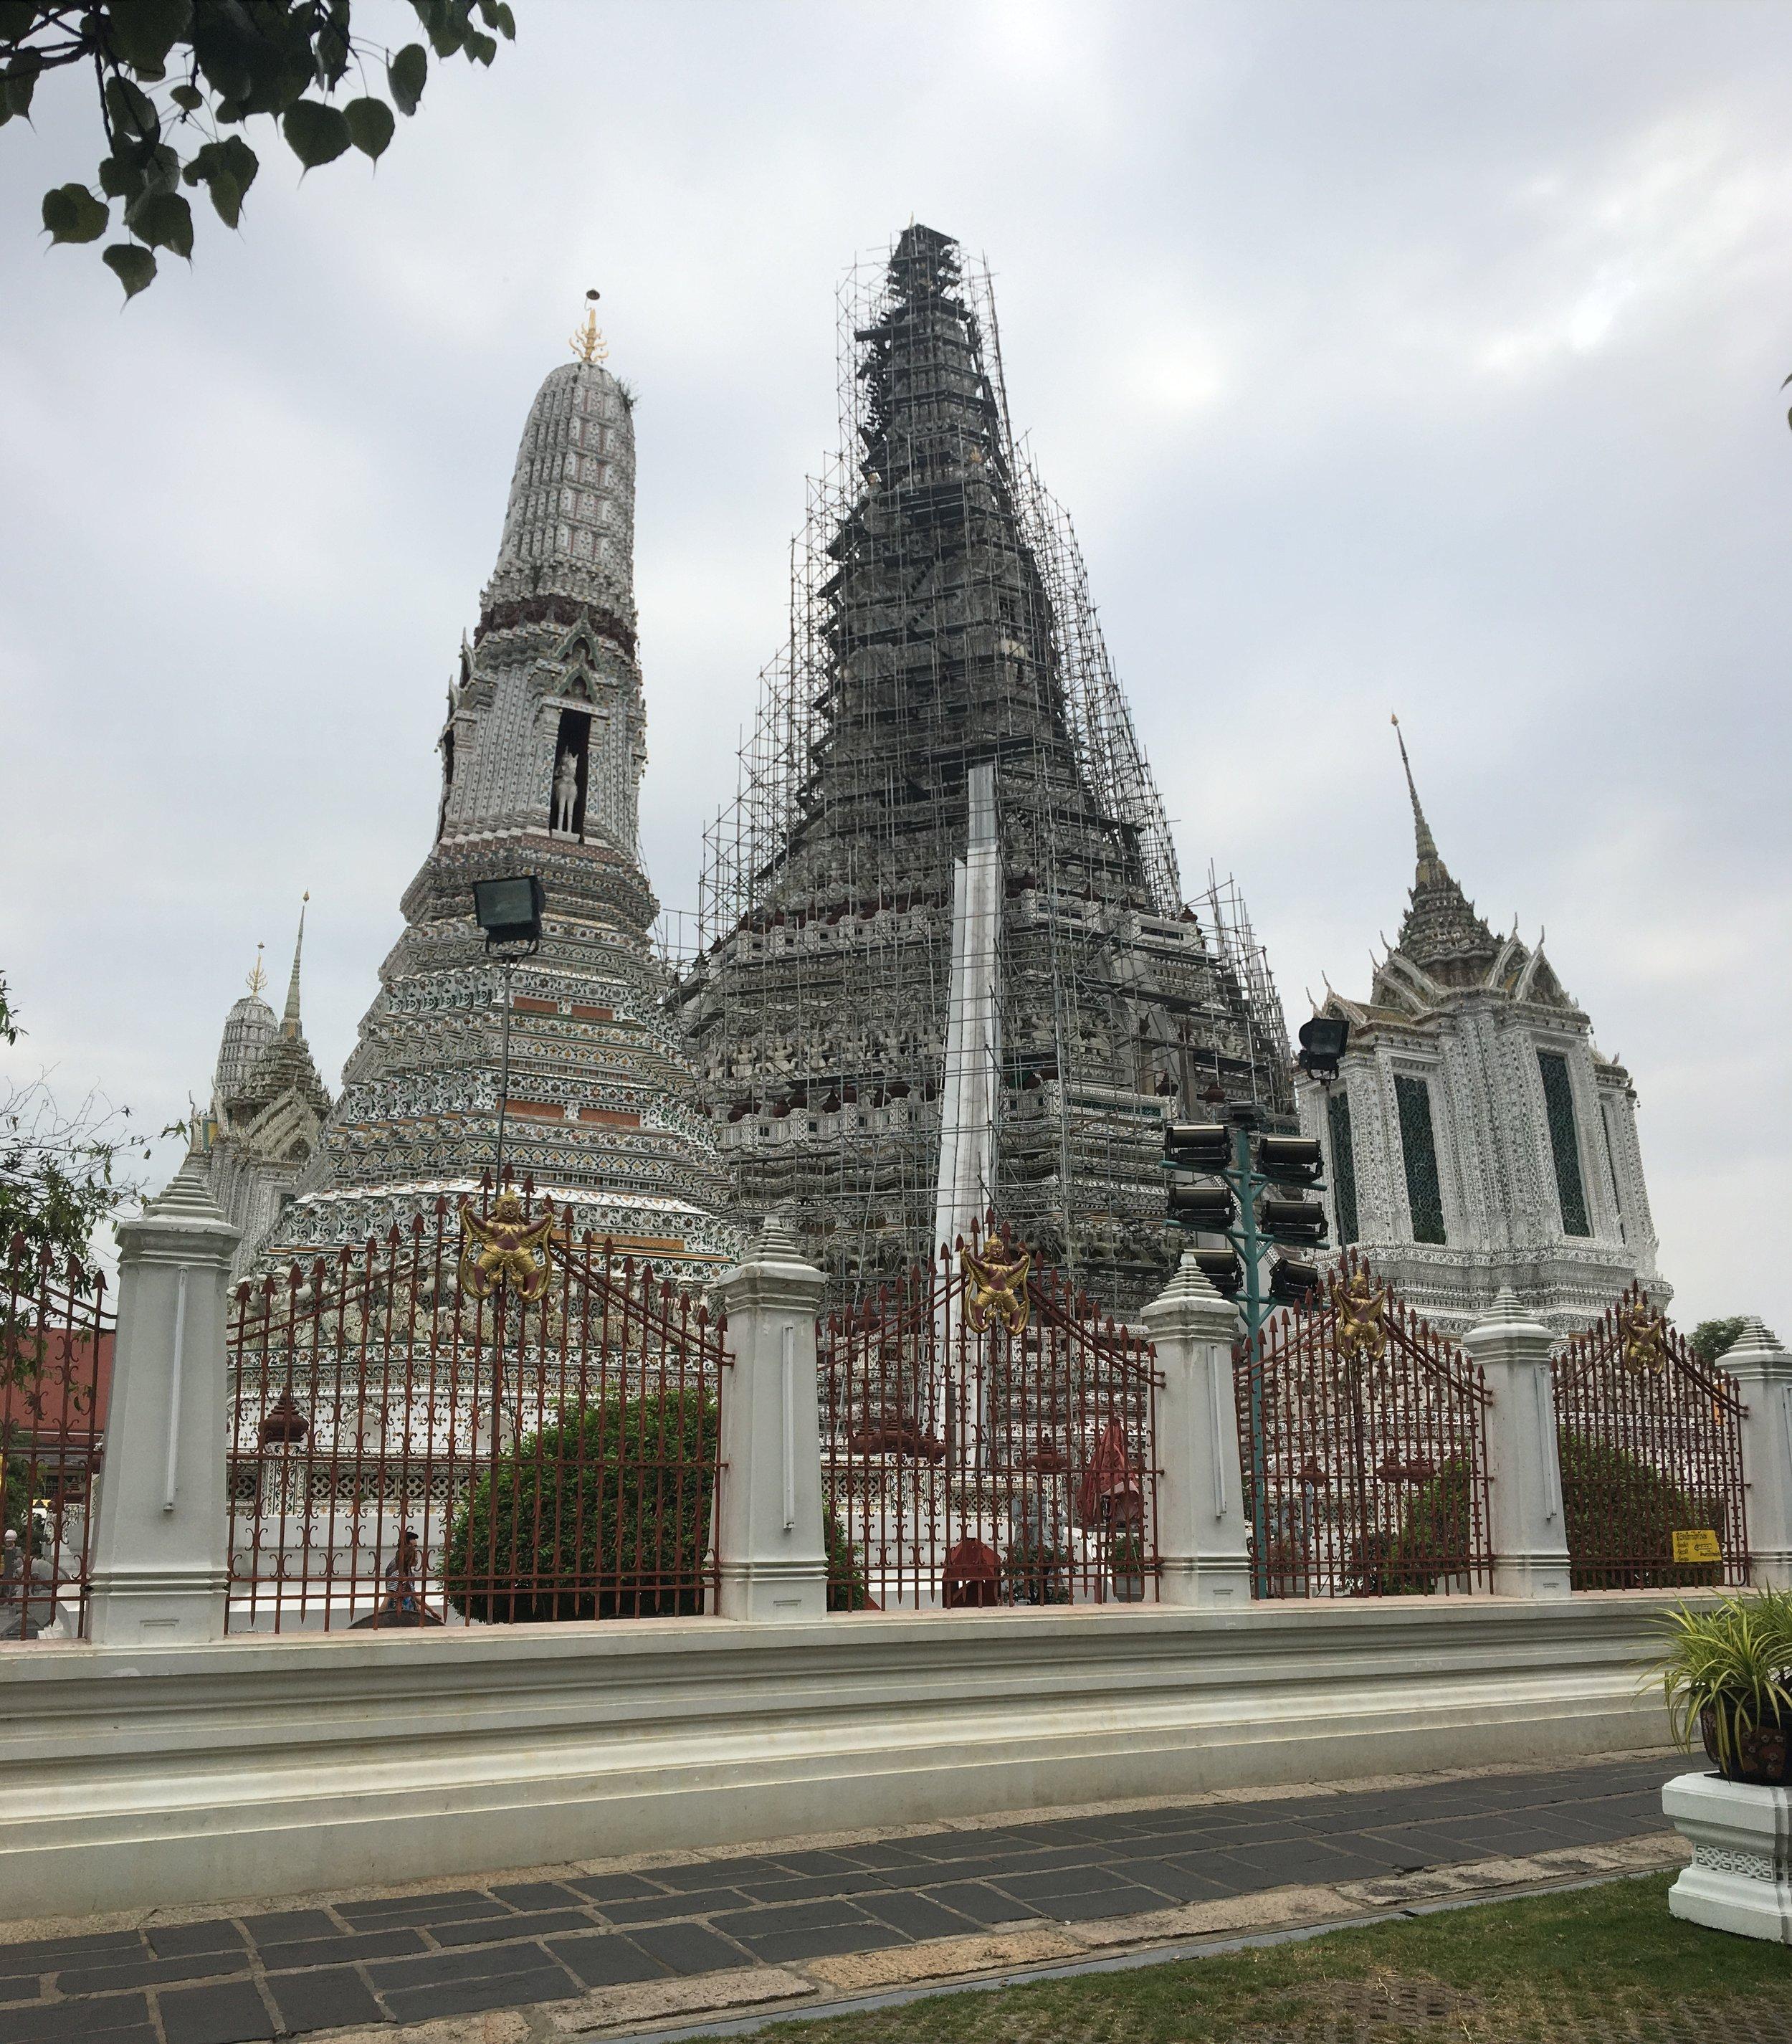 The restoration of Wat Arun